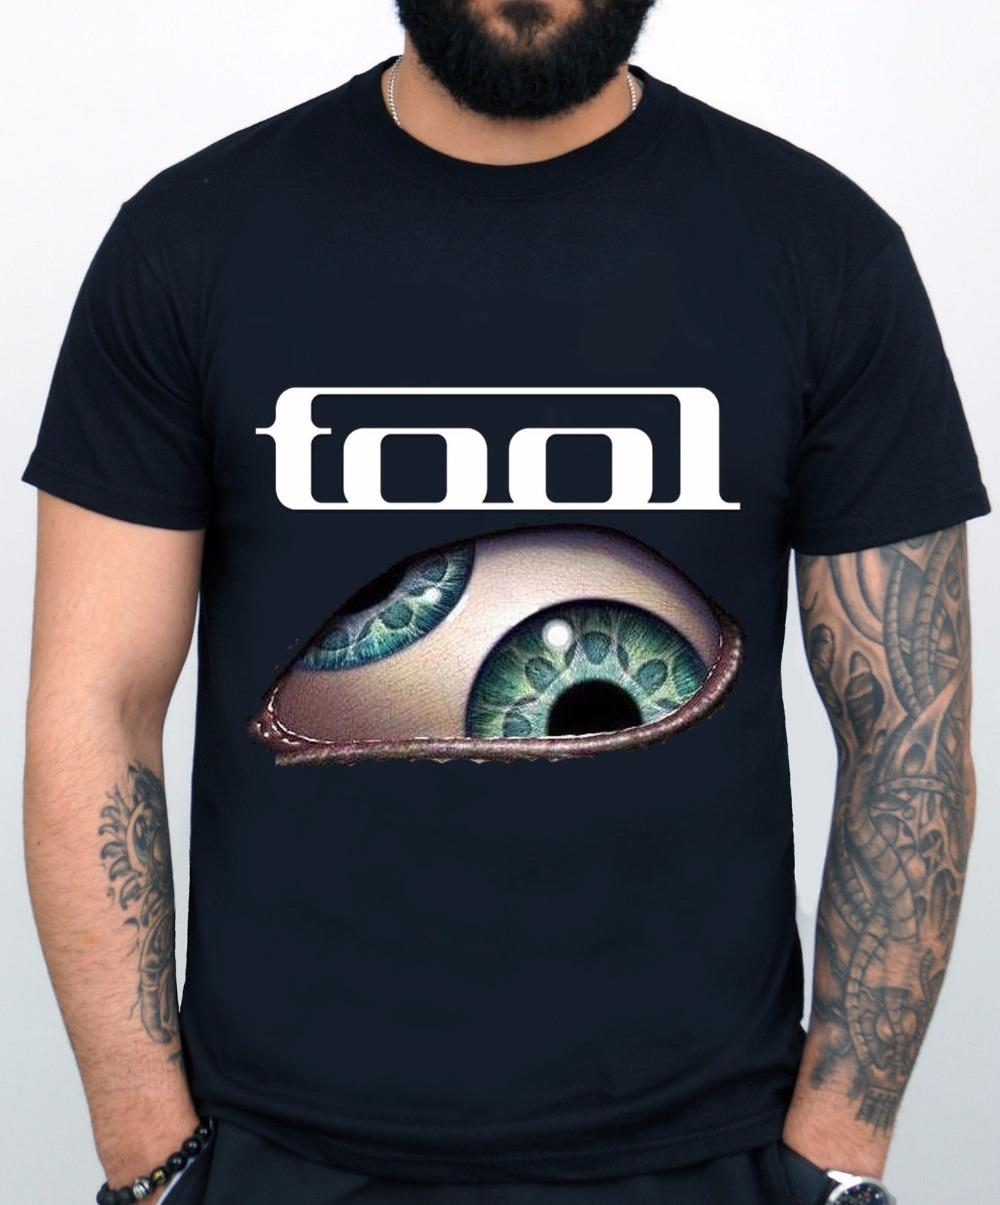 Custom Shirt Design O Neck Men Tool Band T Shirt Rock Band T Shirt